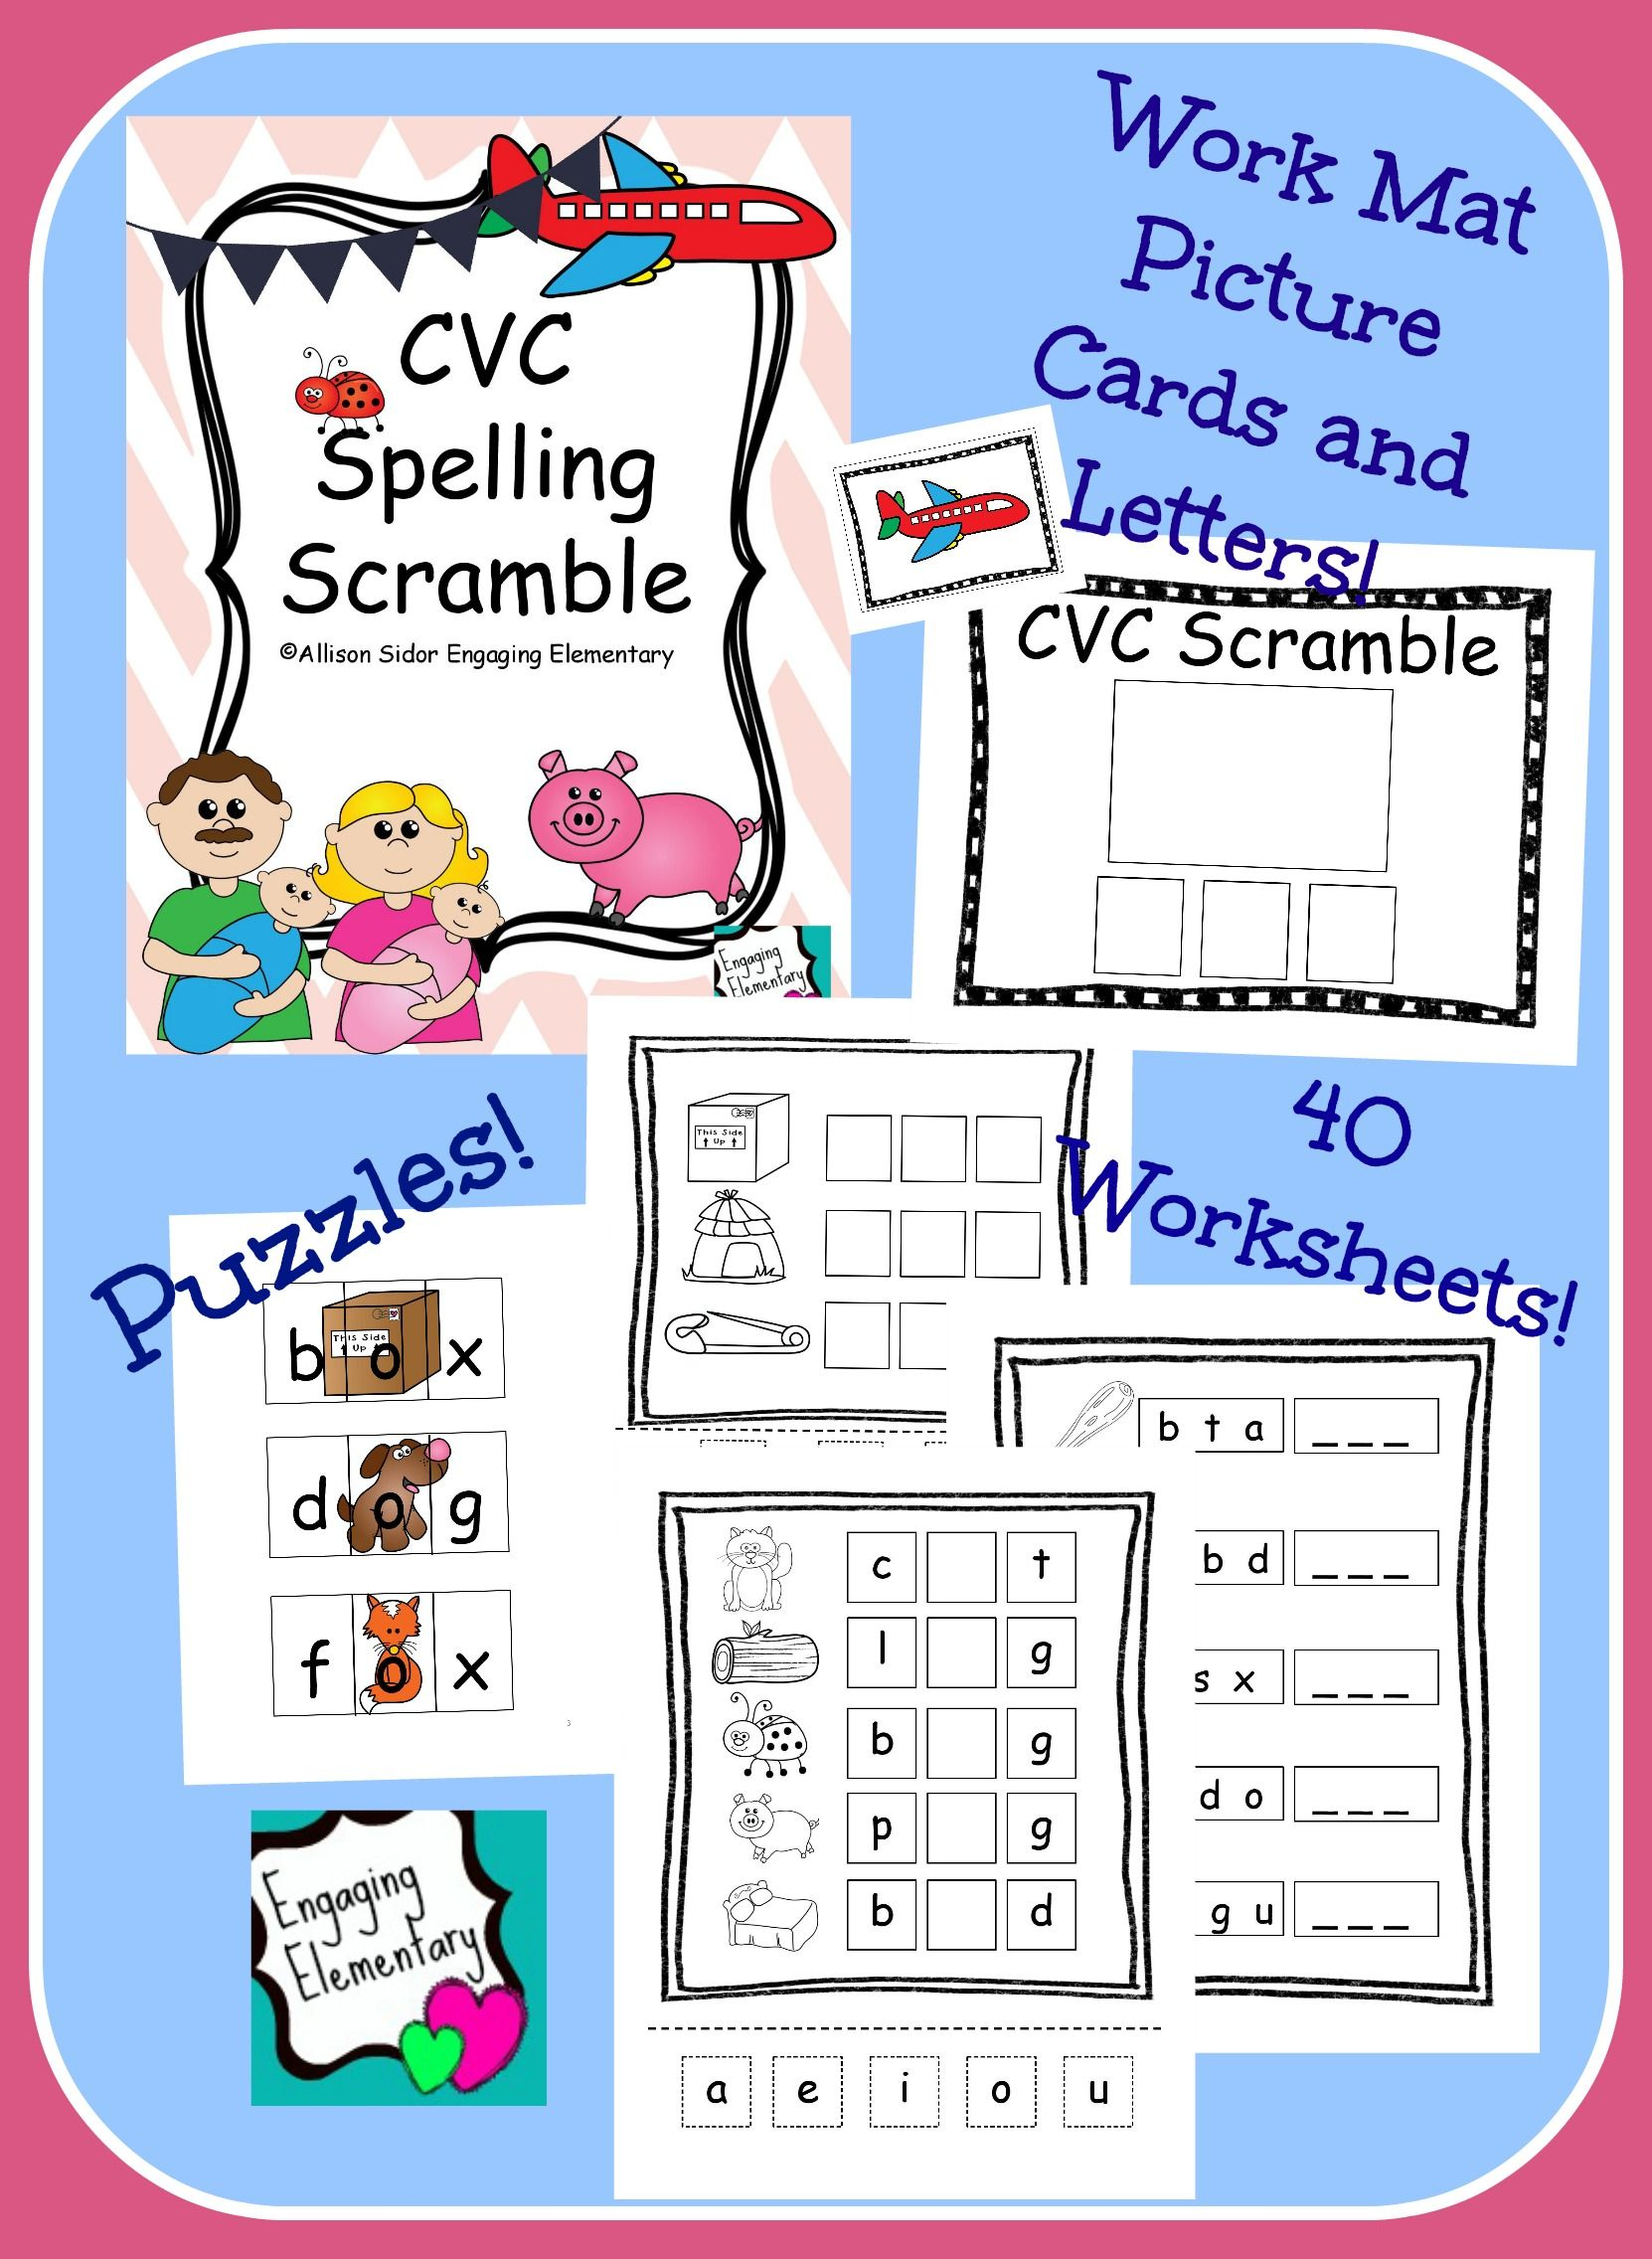 Cvc Spelling Scramble